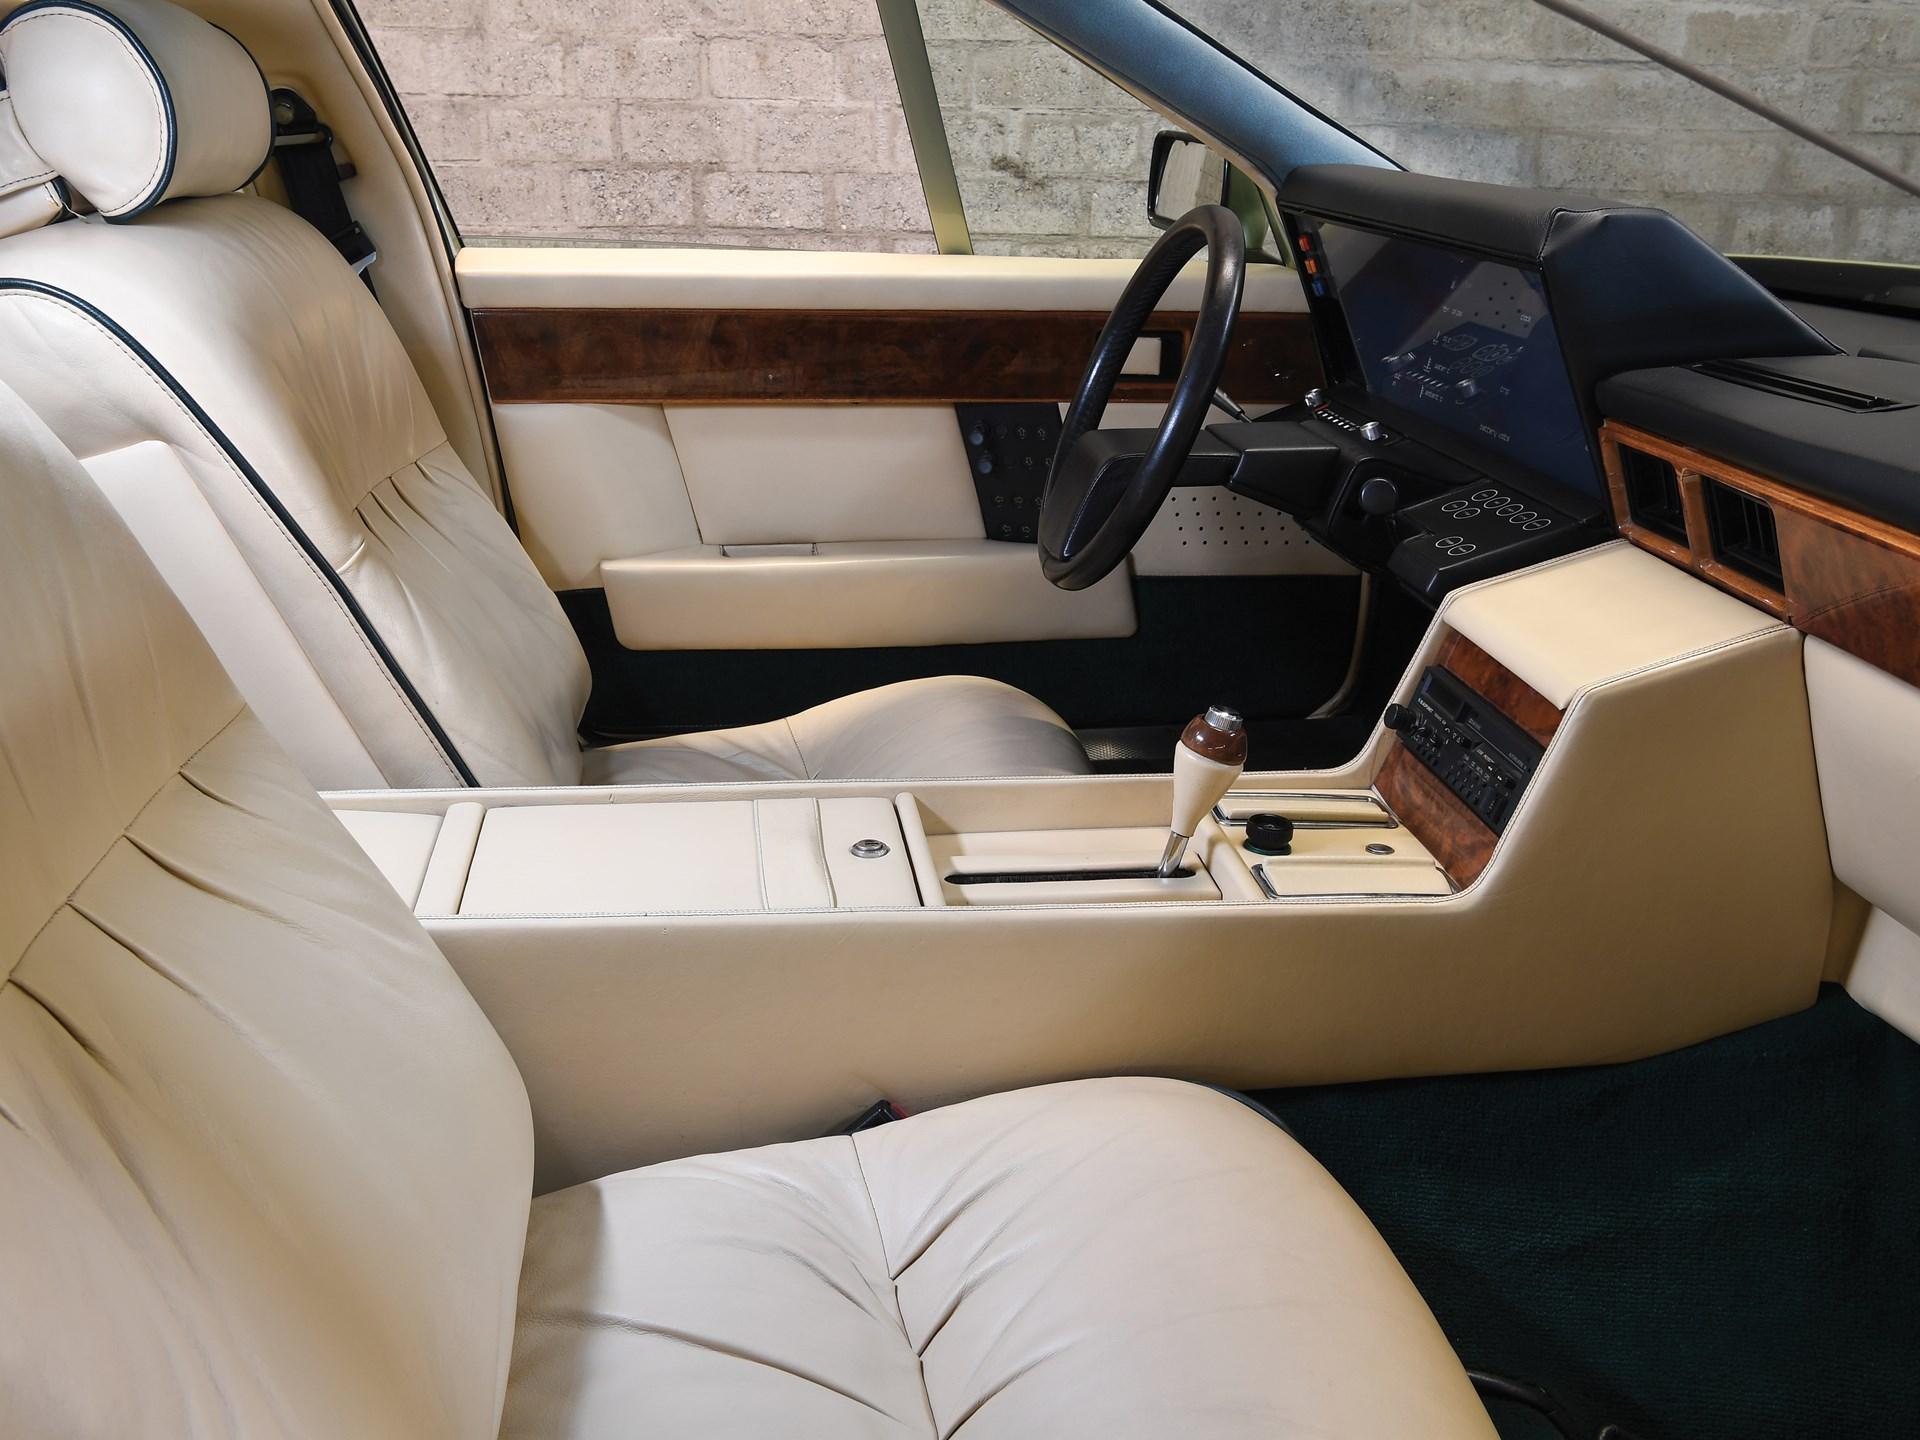 1983 Aston Martin Tickford Lagonda interior